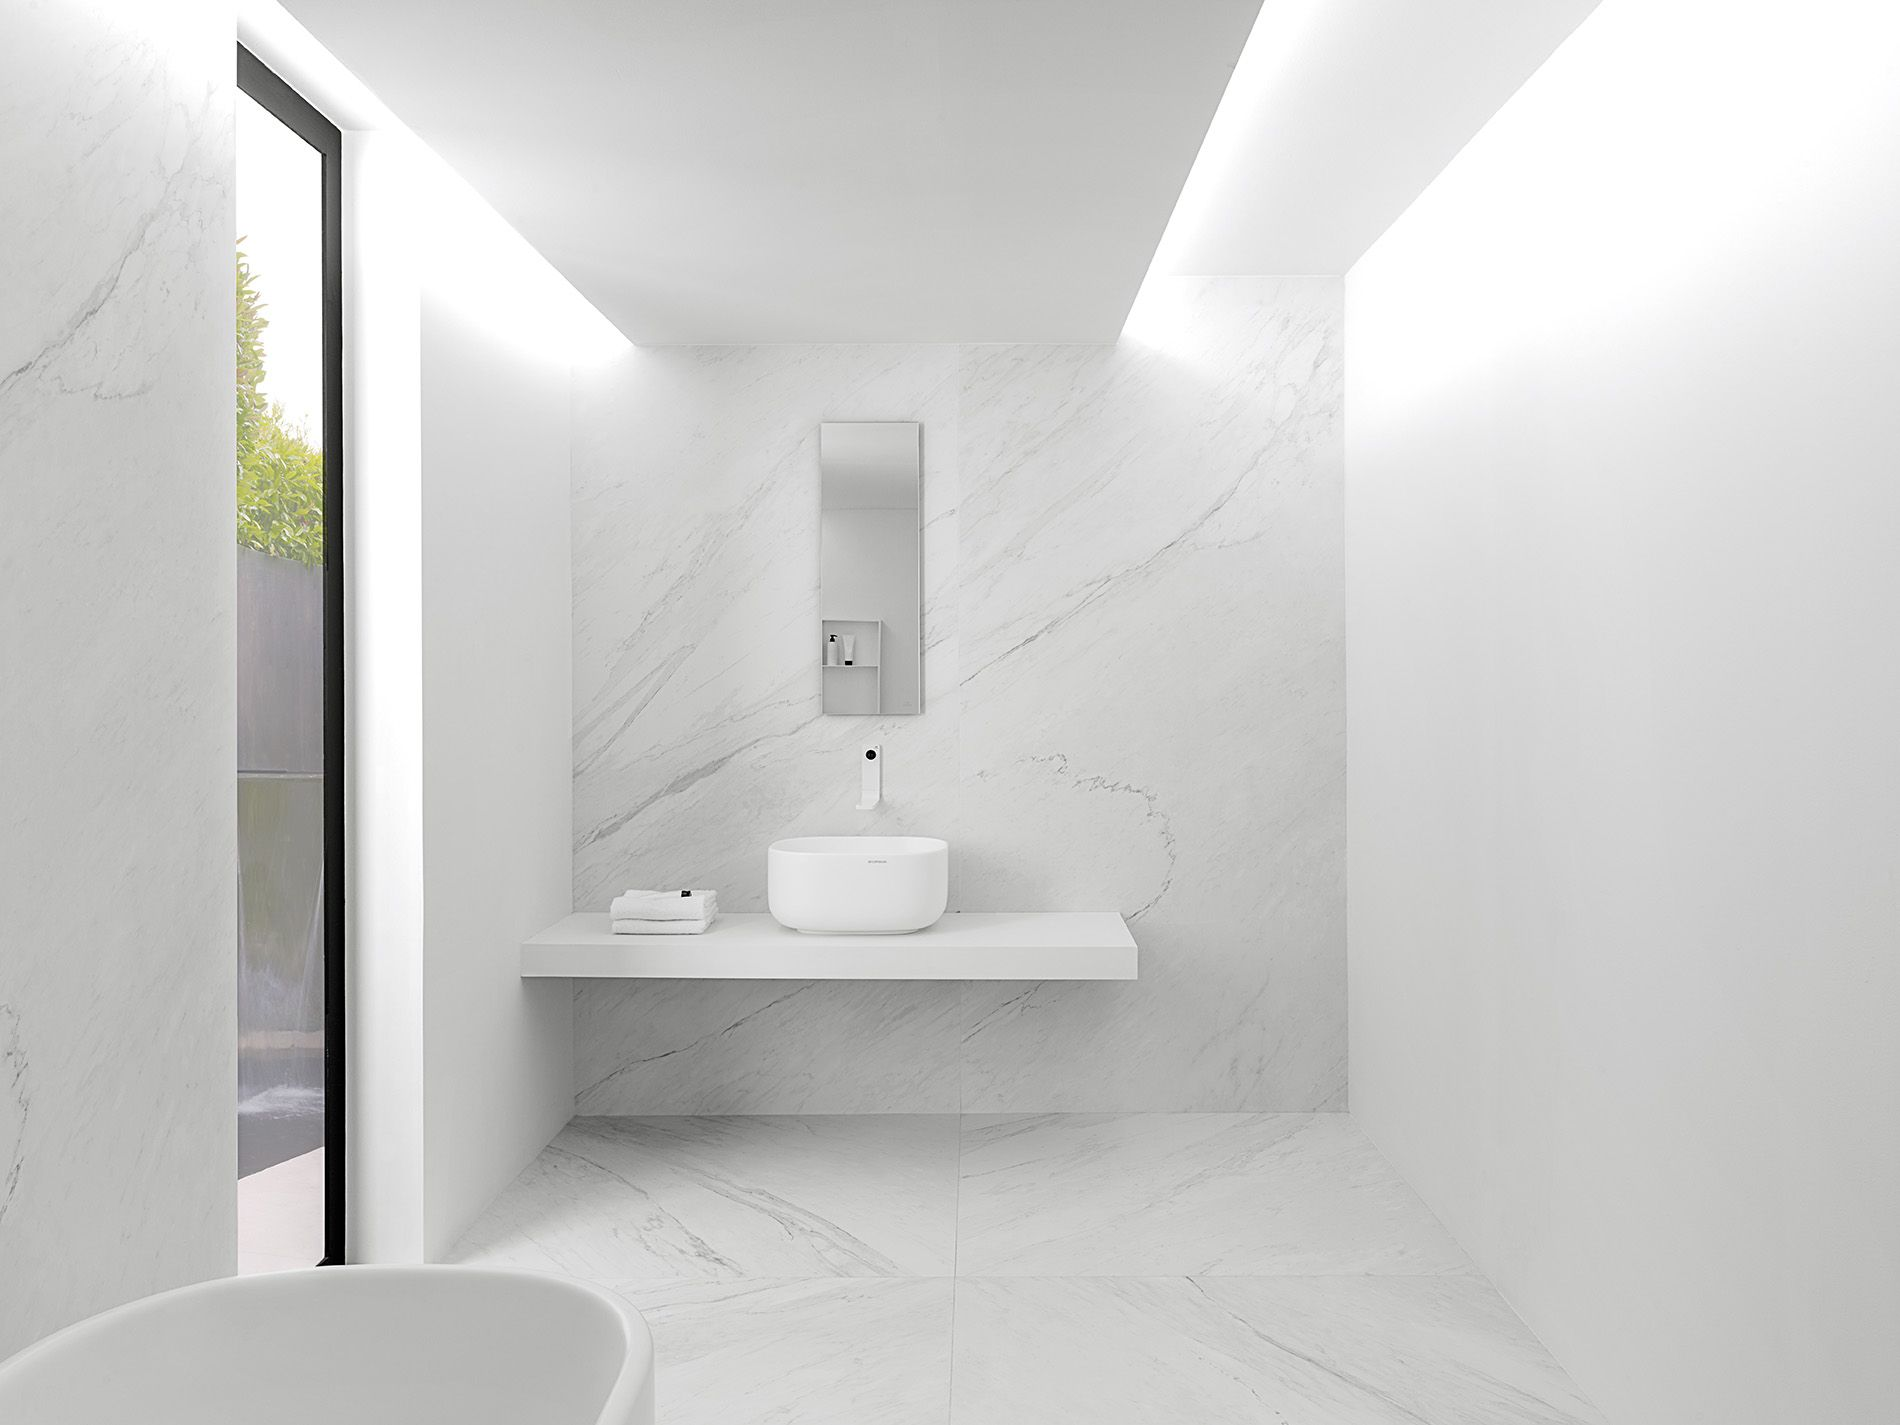 XLIGHT Premium Lush White   #URBATEK #Noken #PORCELANOSA   Gres Porcelánico  De Fino Espesor   Porcelain Stone Tile, Marble Floor Tile   #precious  #stones ...